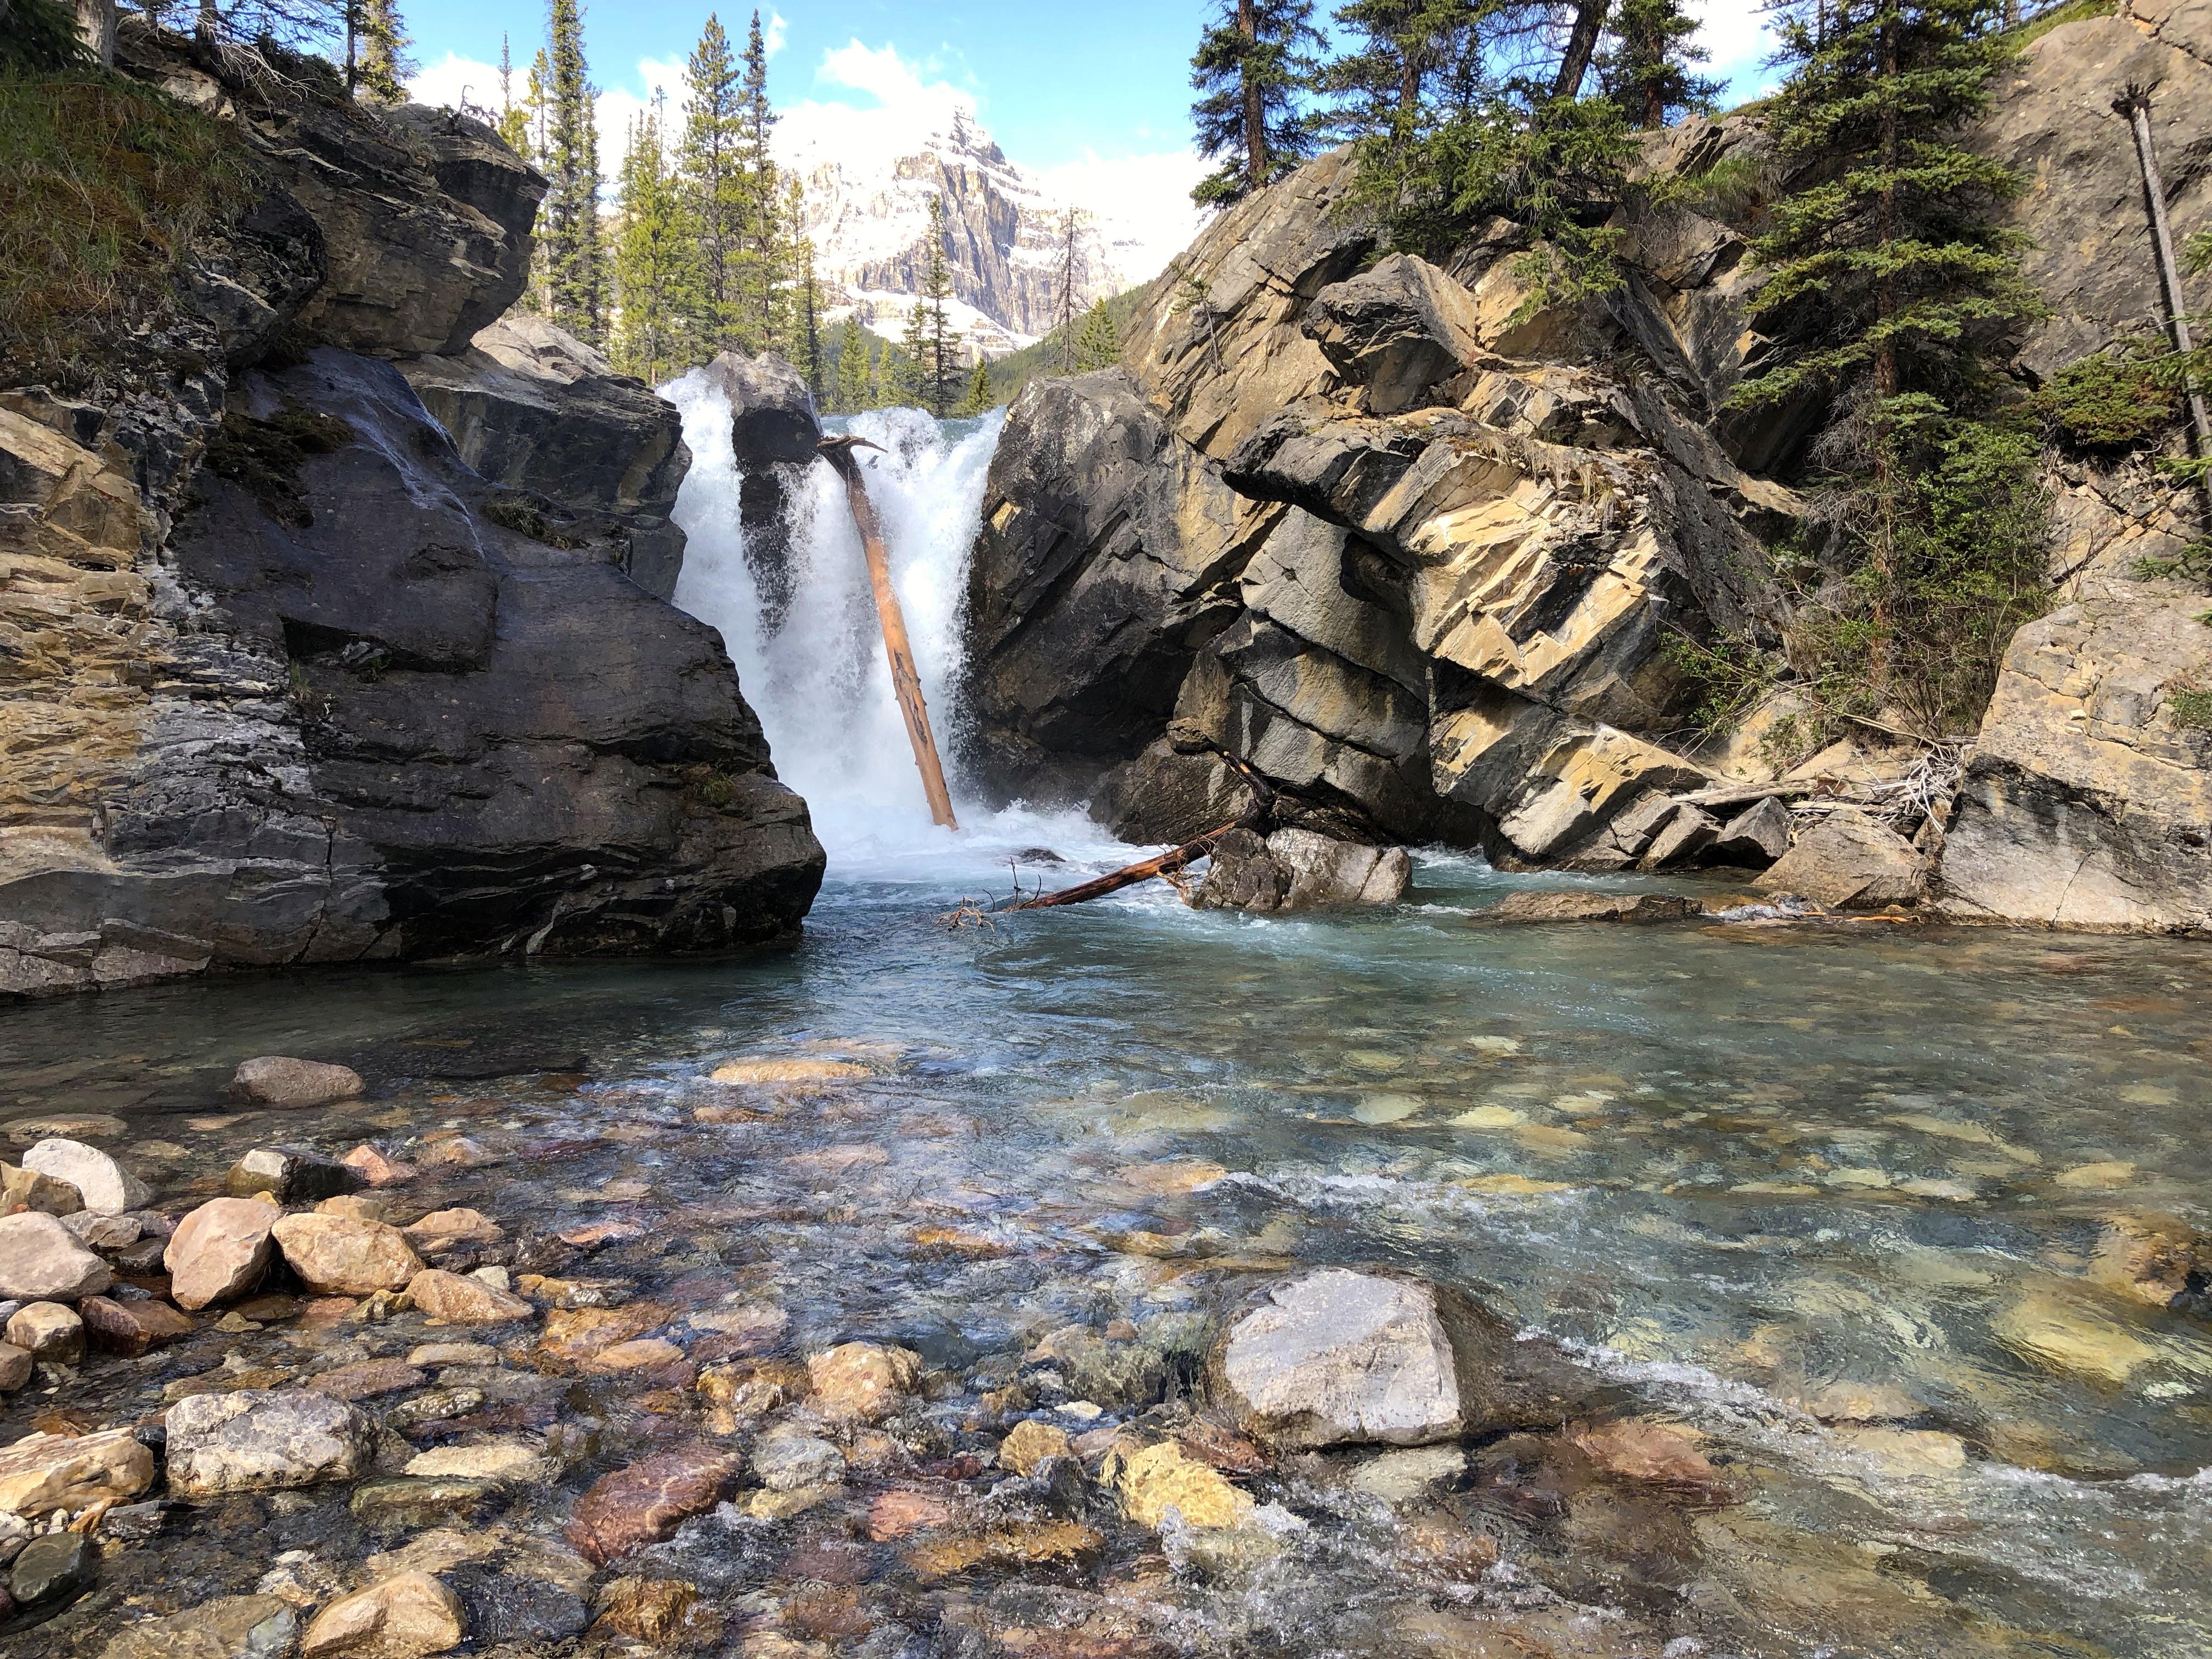 Canada Rockies TrekAmerica Itrekhere 2018 244